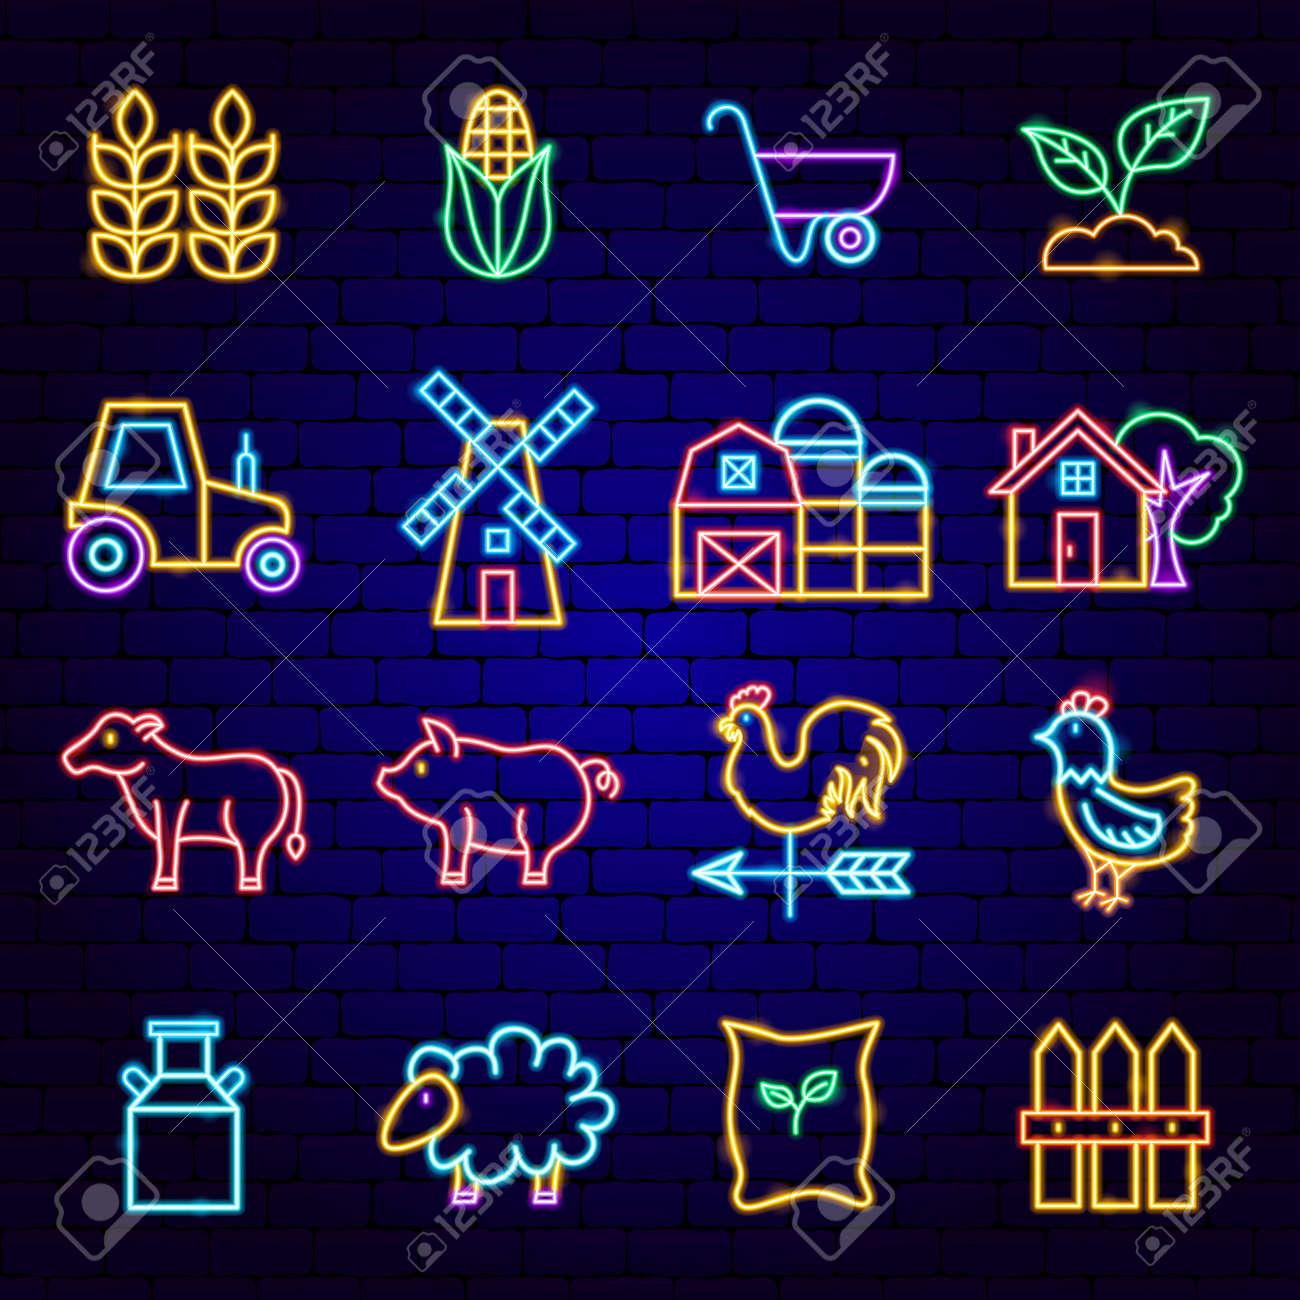 Farming Neon Icons - 169264489